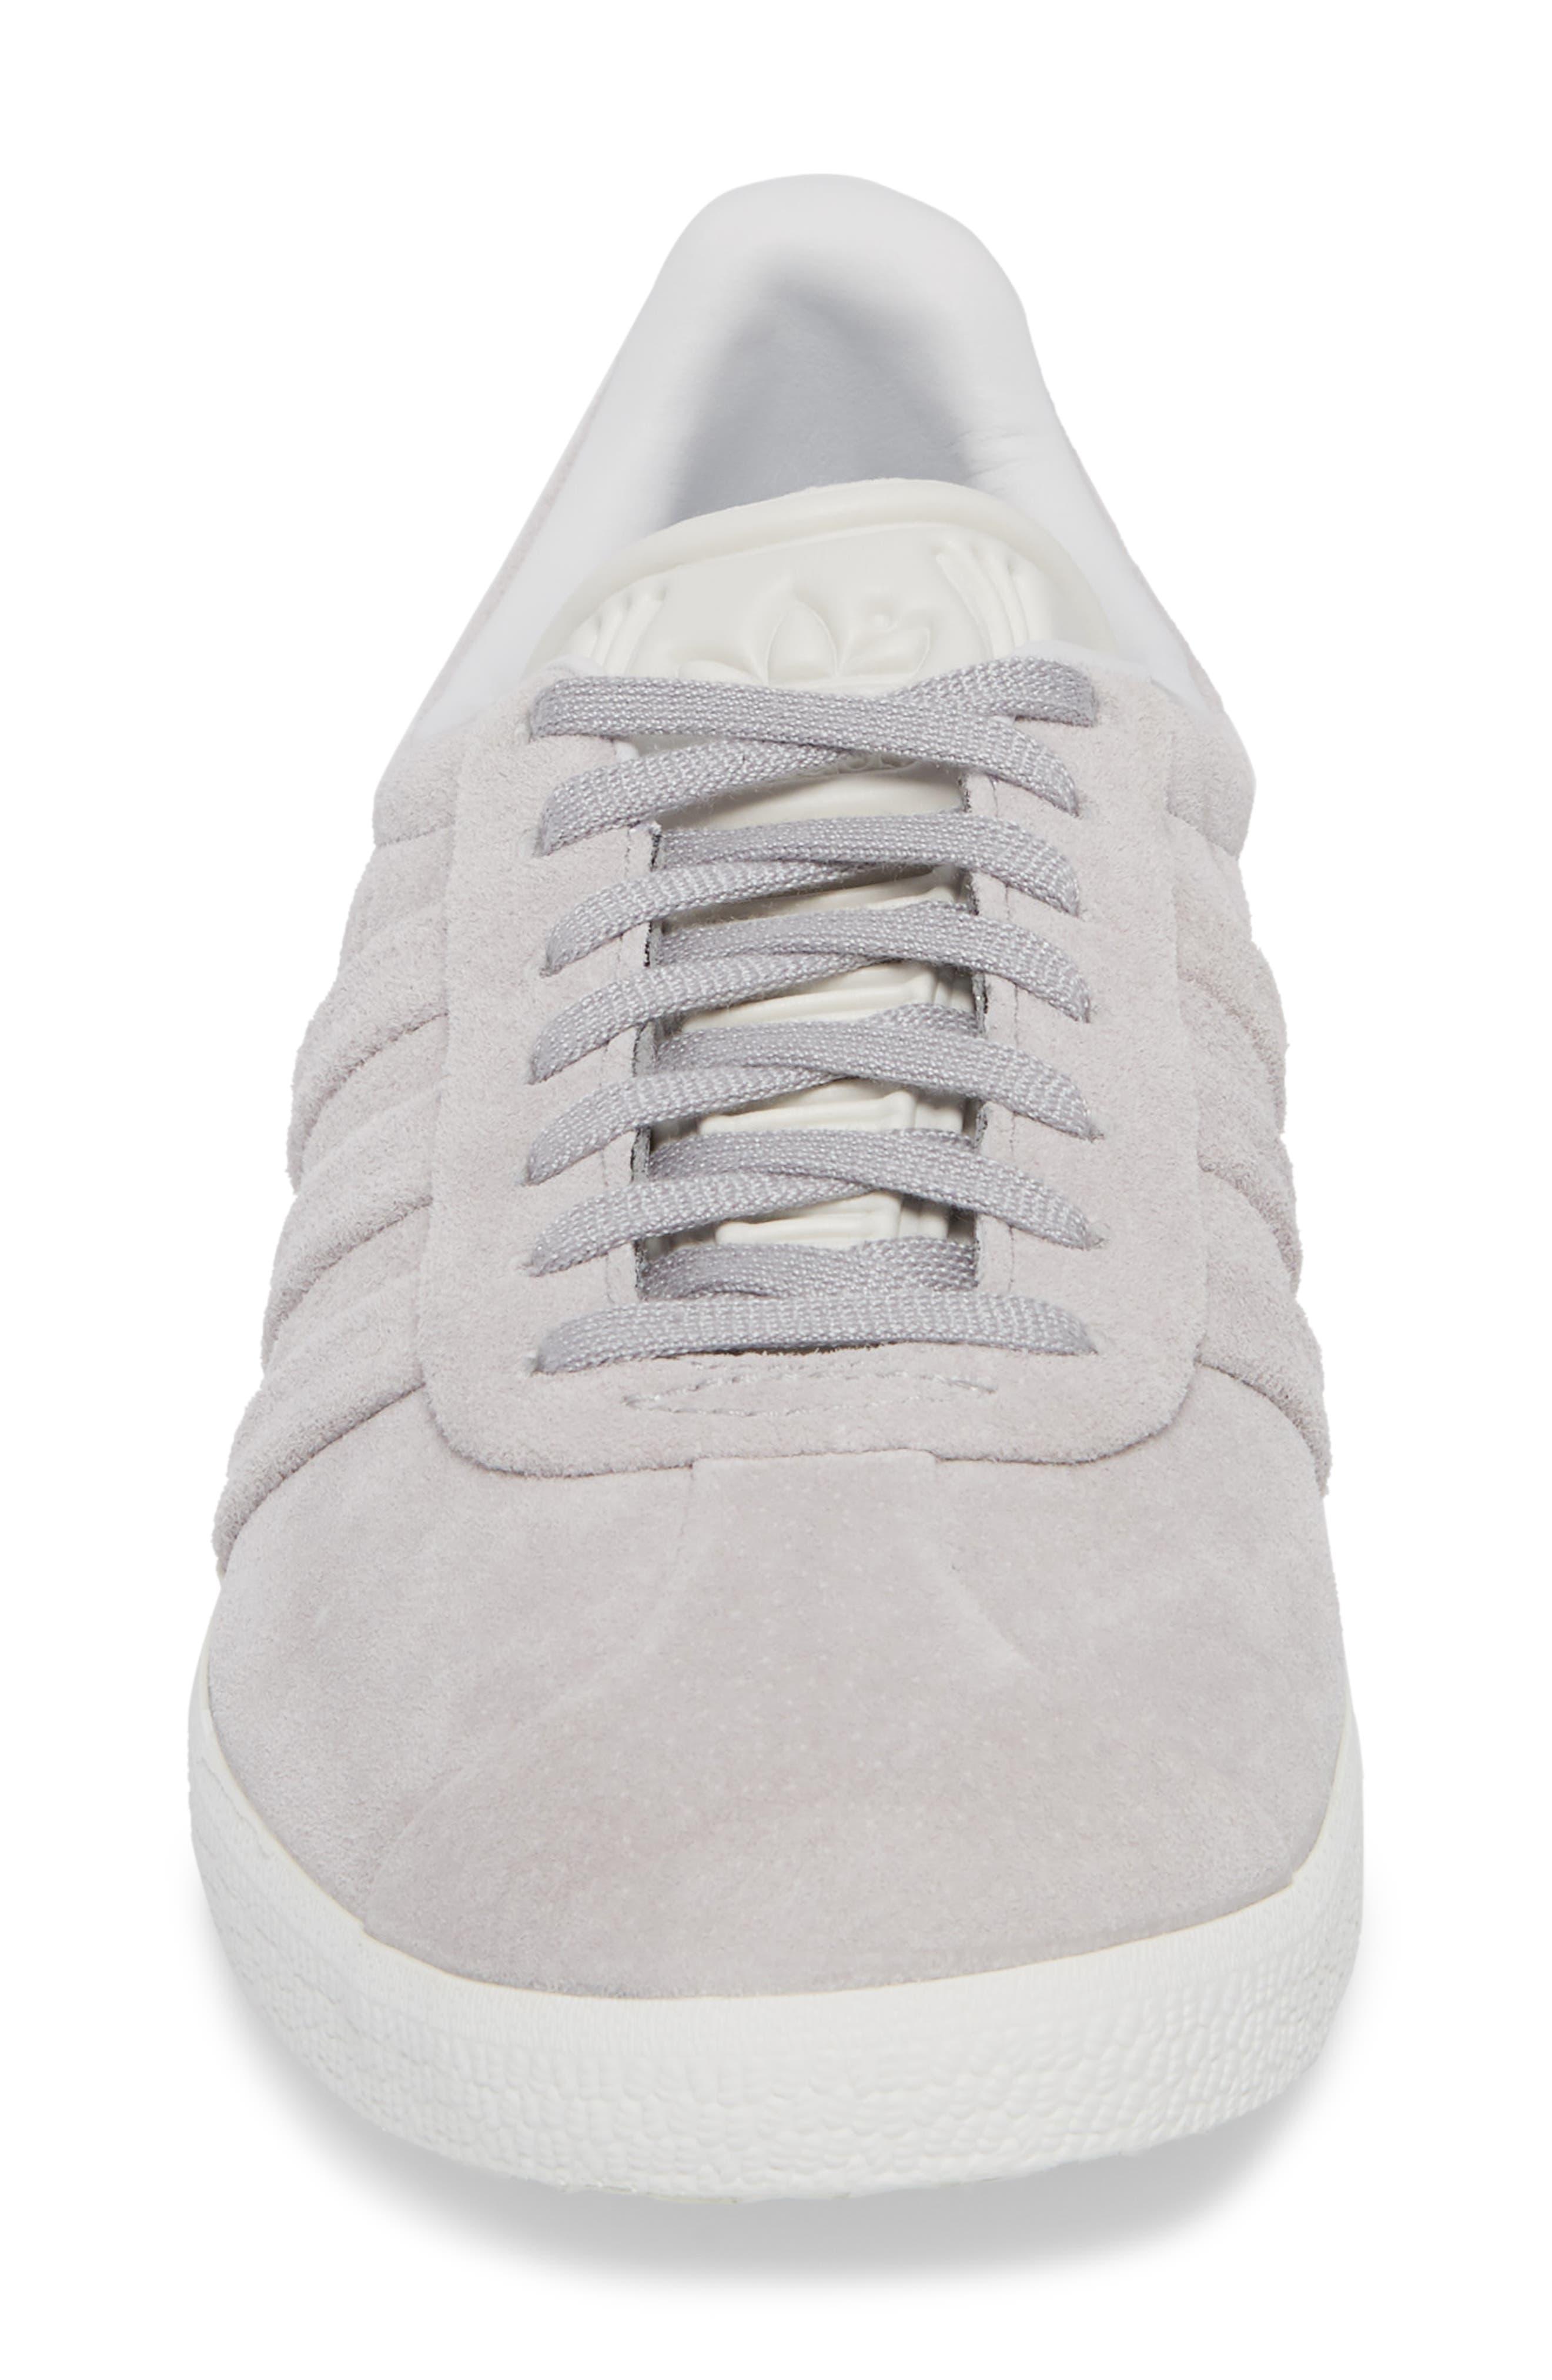 Gazelle Stitch & Turn Sneaker,                             Alternate thumbnail 4, color,                             GREY/ GREY/ WHITE